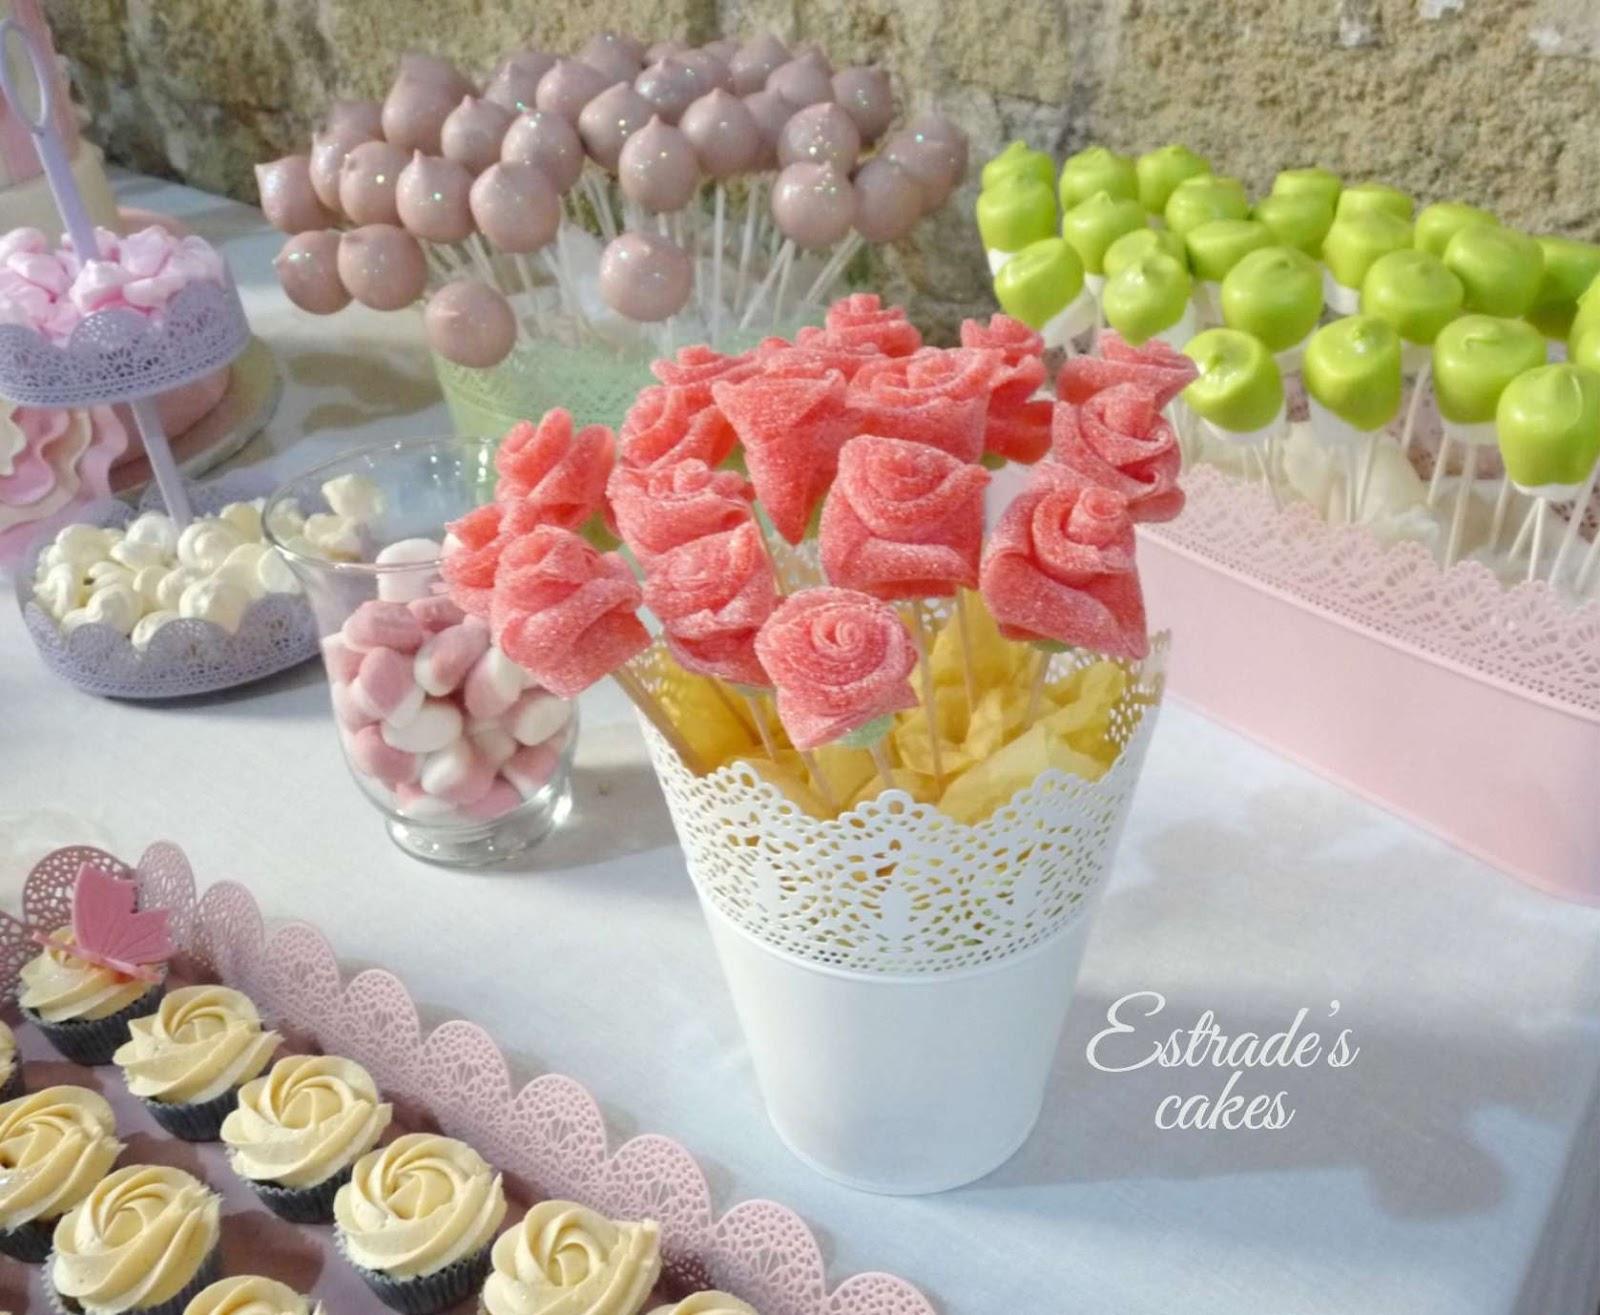 Estrade 39 s cakes rosas de chuches para una mesa dulce for Fotos de mesas de chuches para bodas